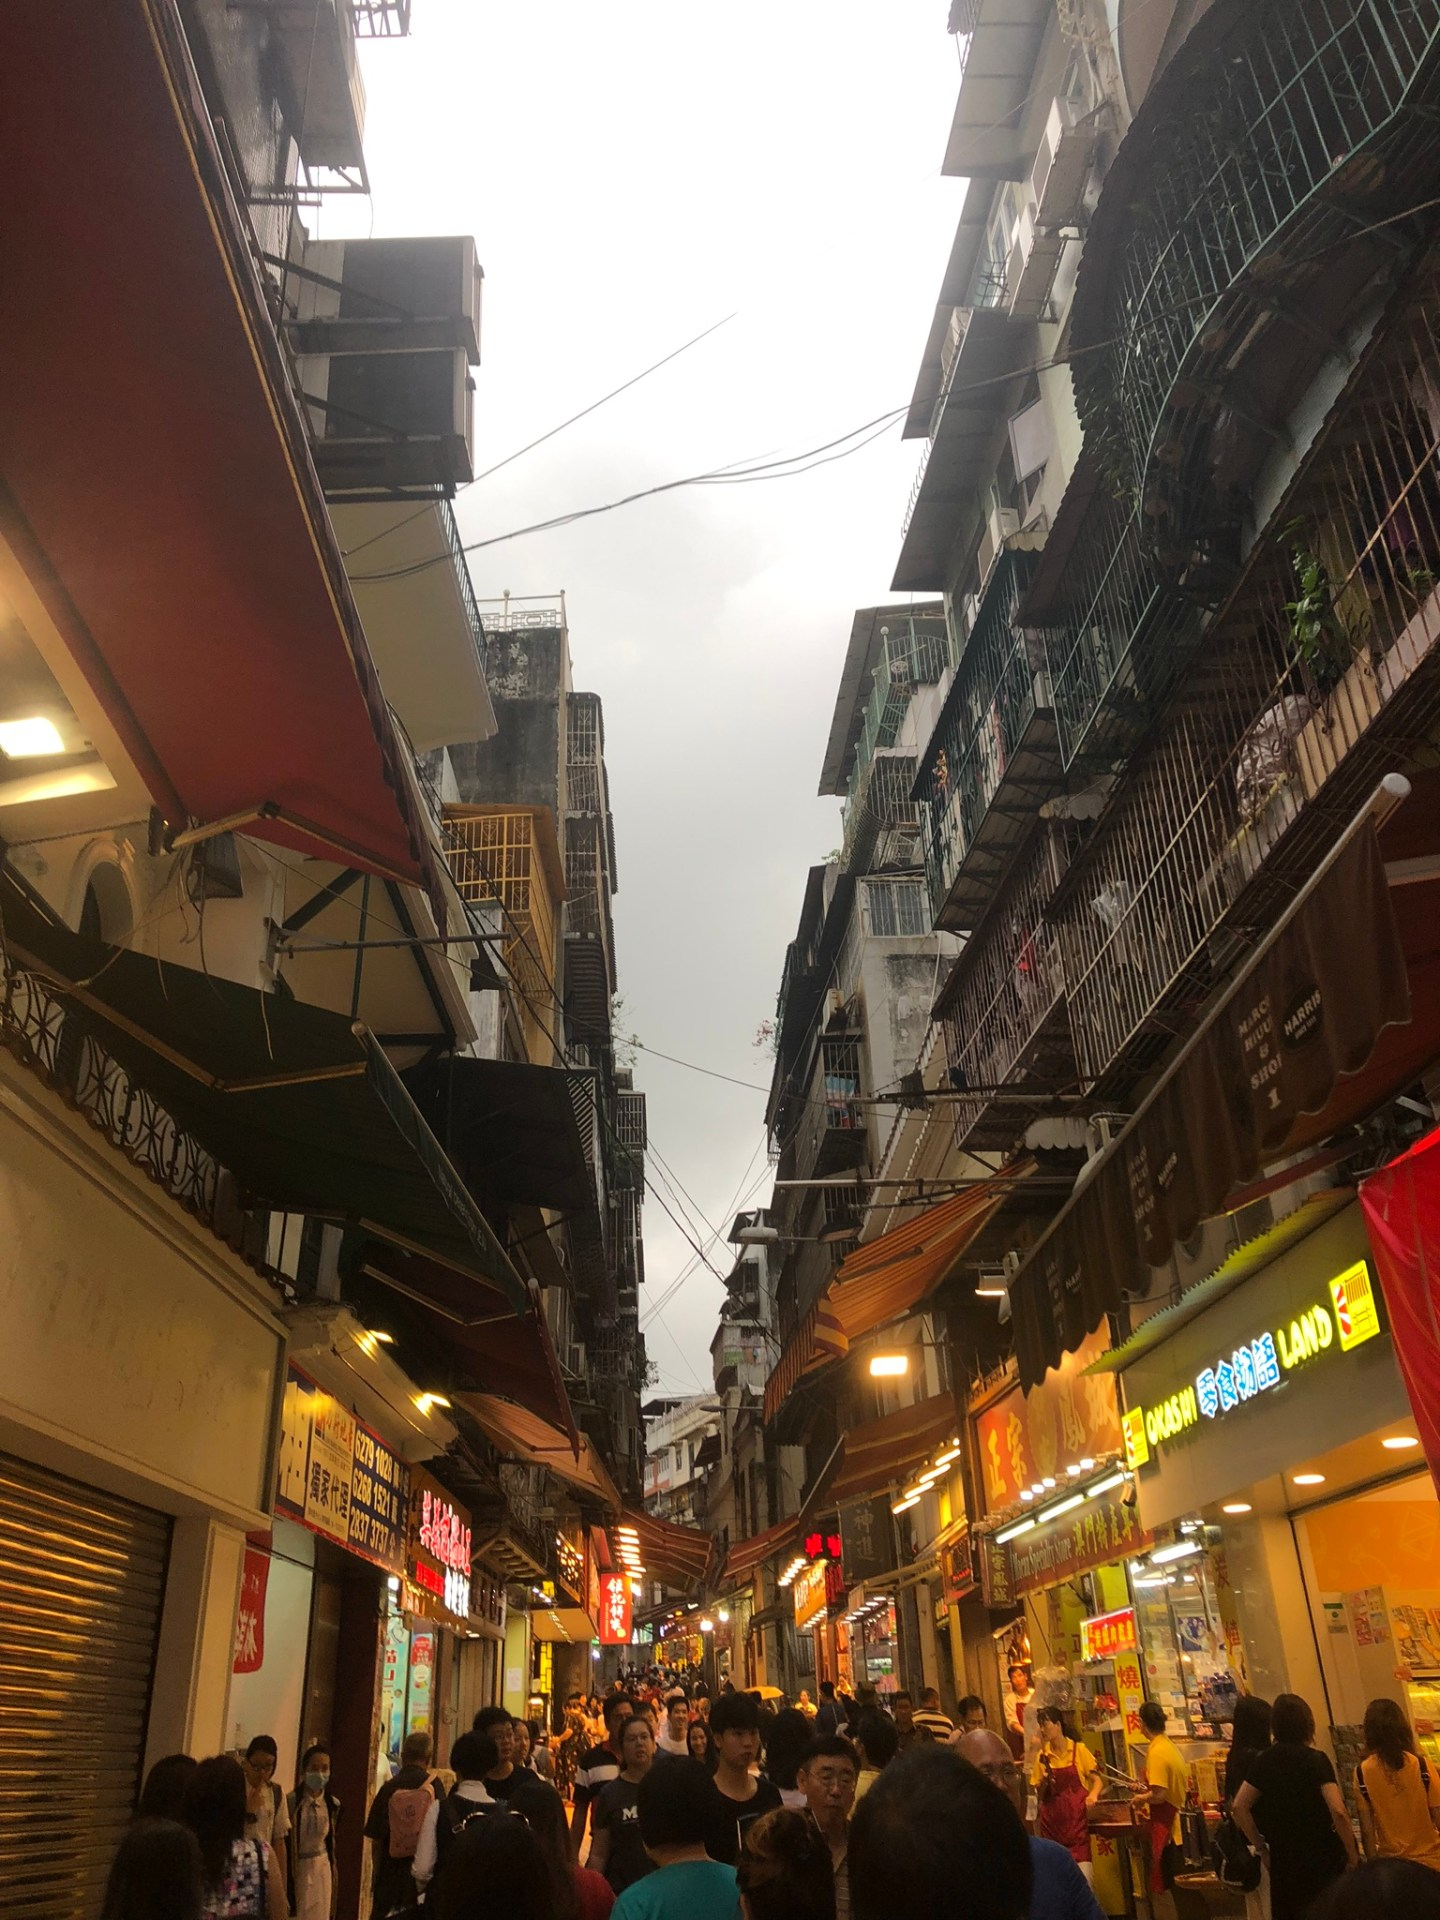 The streets of Macau, China